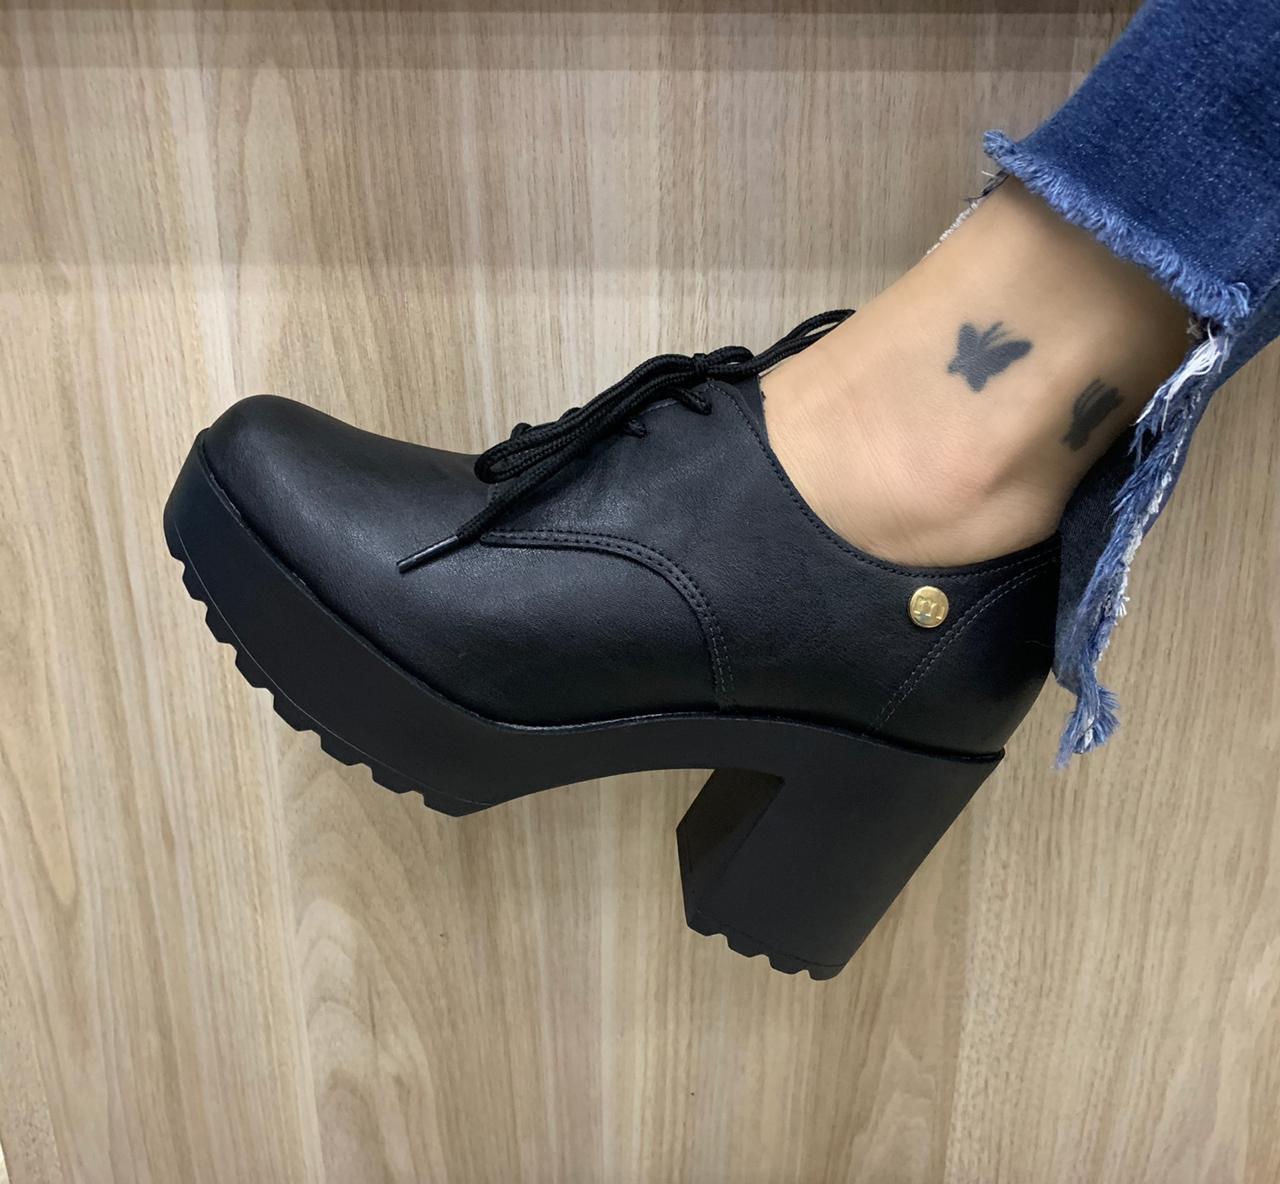 Sapato Oxford Moleca Salto Tratorado 5647.211/213 Feminino